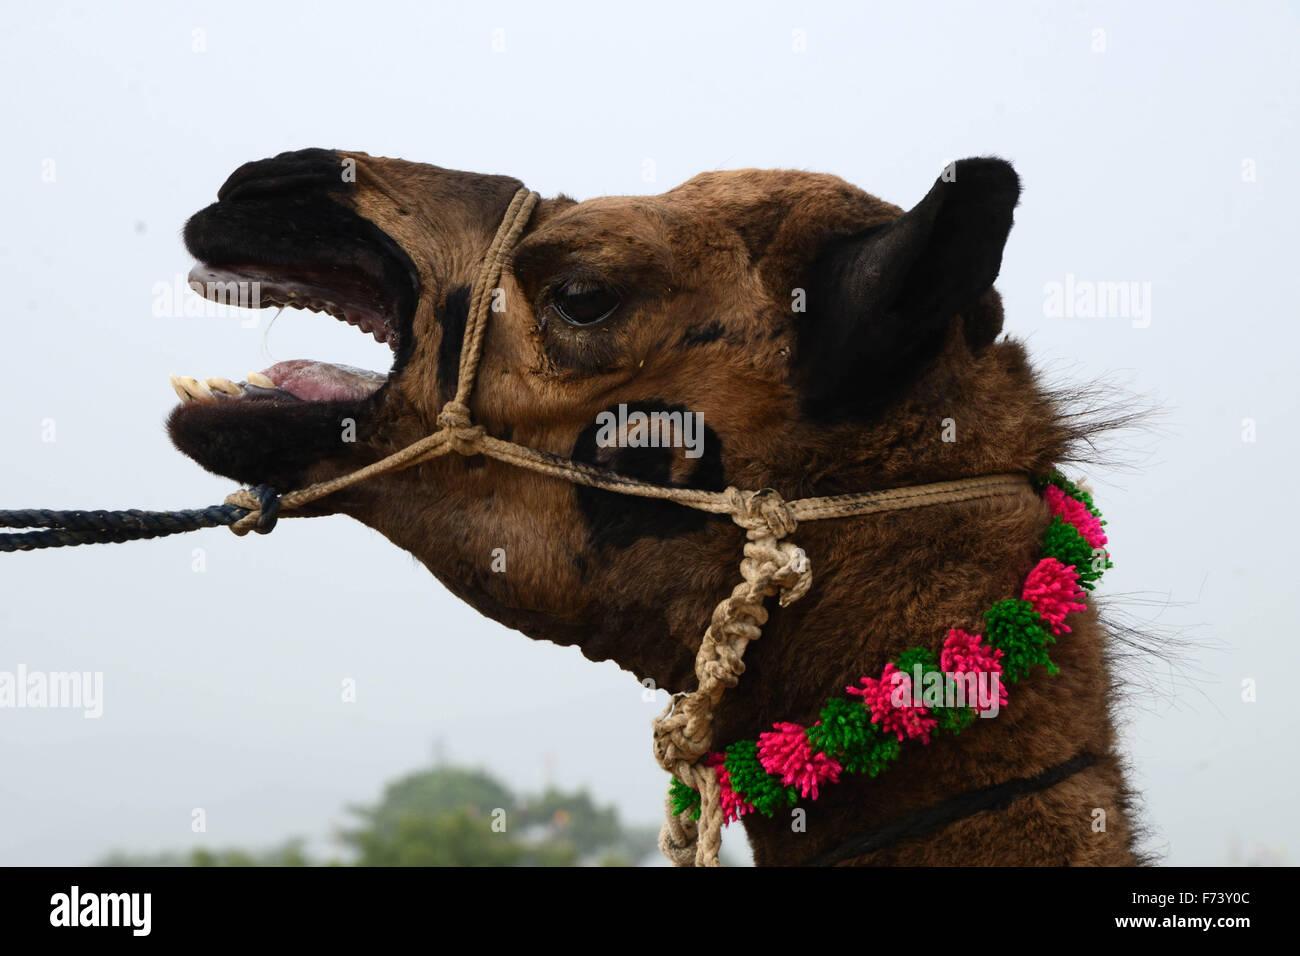 Camel in fiera del bestiame, pushkar, Rajasthan, India, Asia Immagini Stock